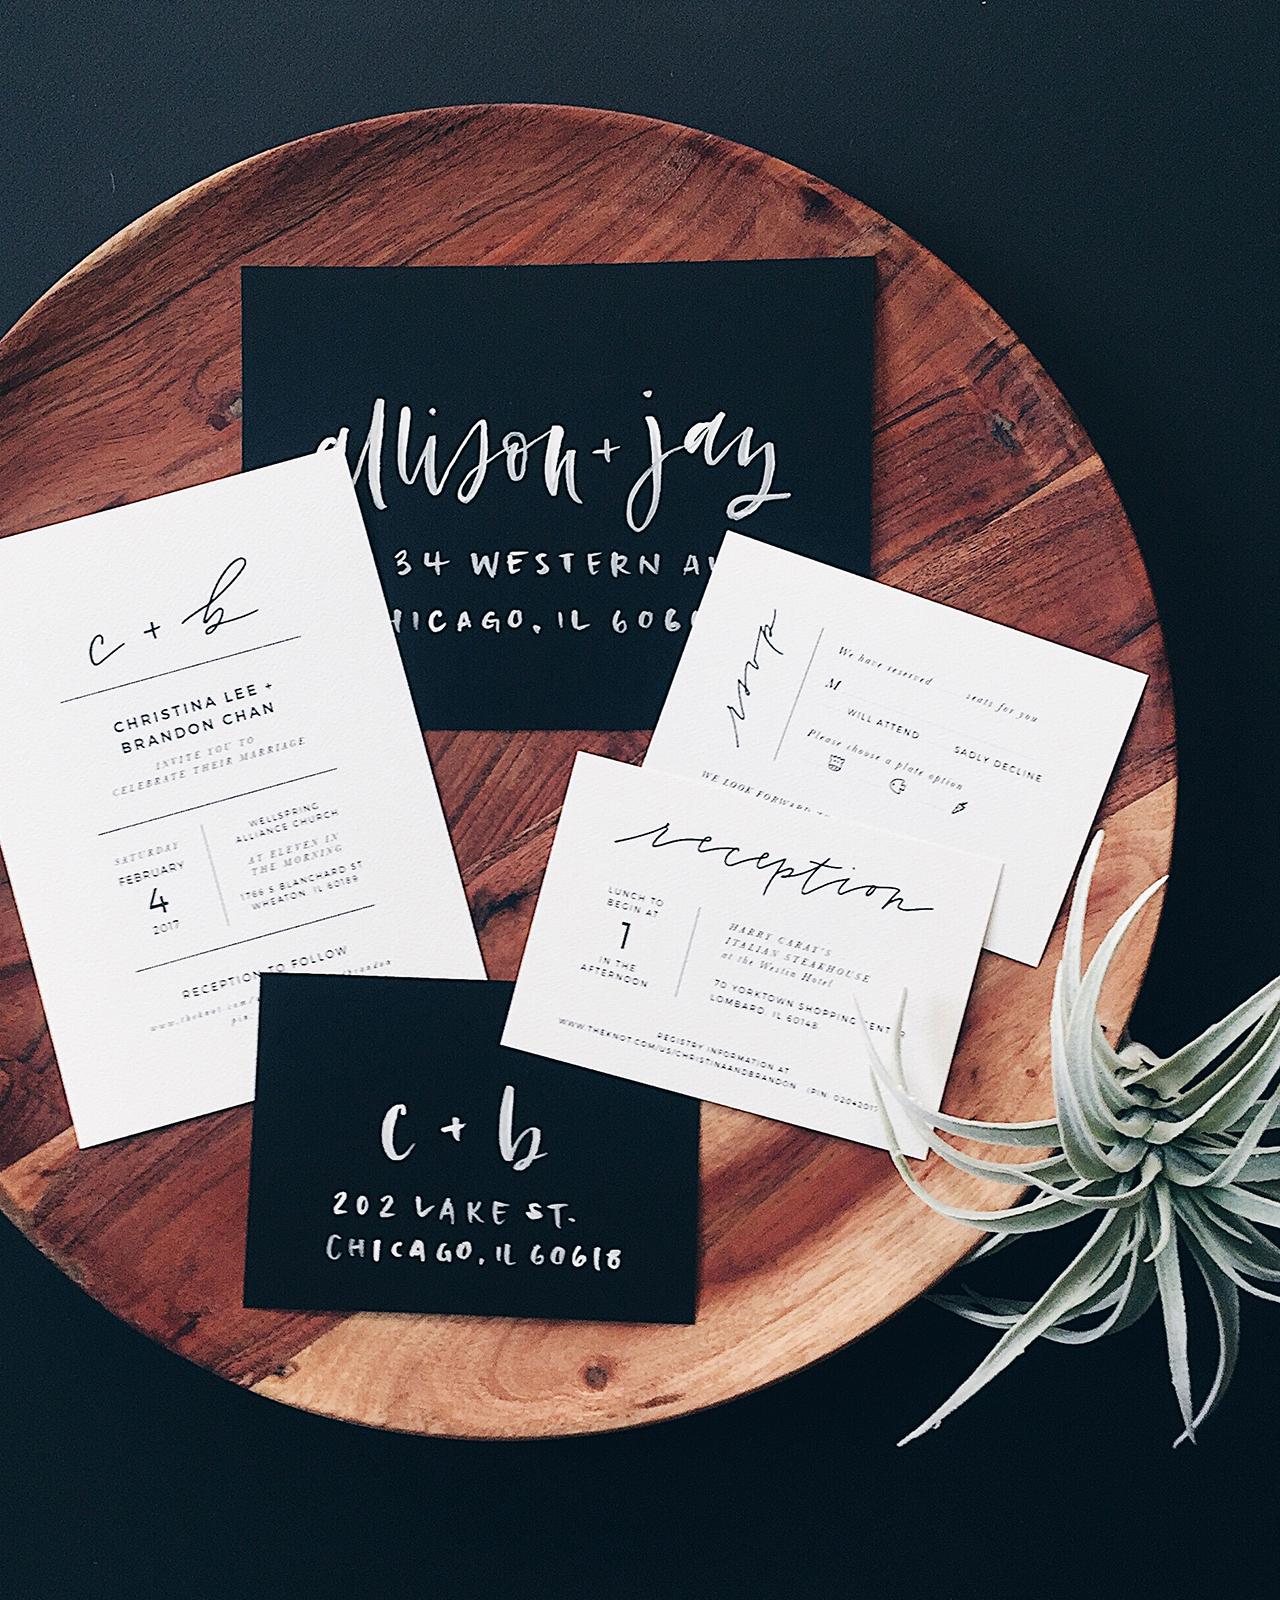 Black and White Invitation New Minimalist Black and White Hand Lettered Wedding Invitations